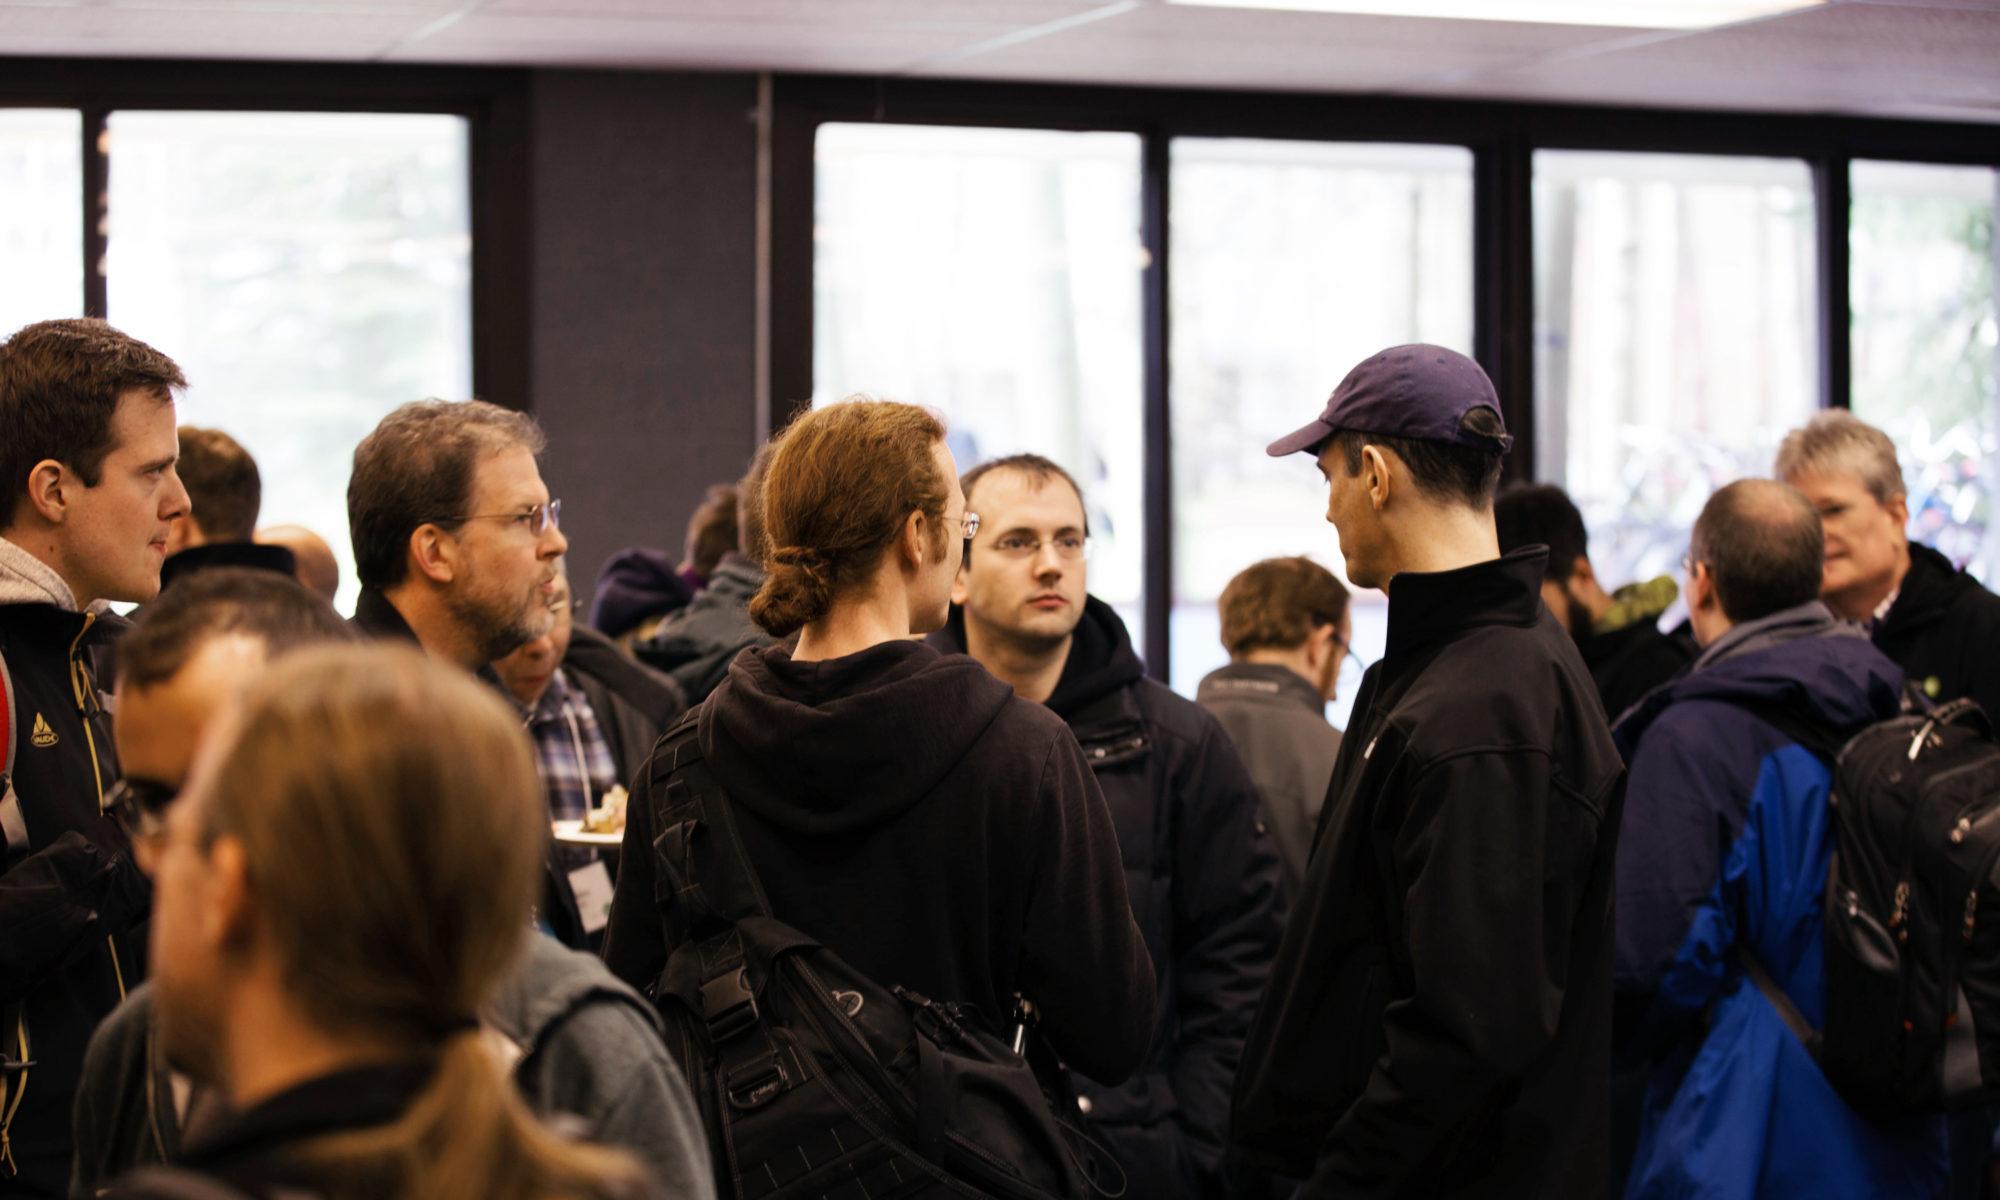 C++ Community Organizers